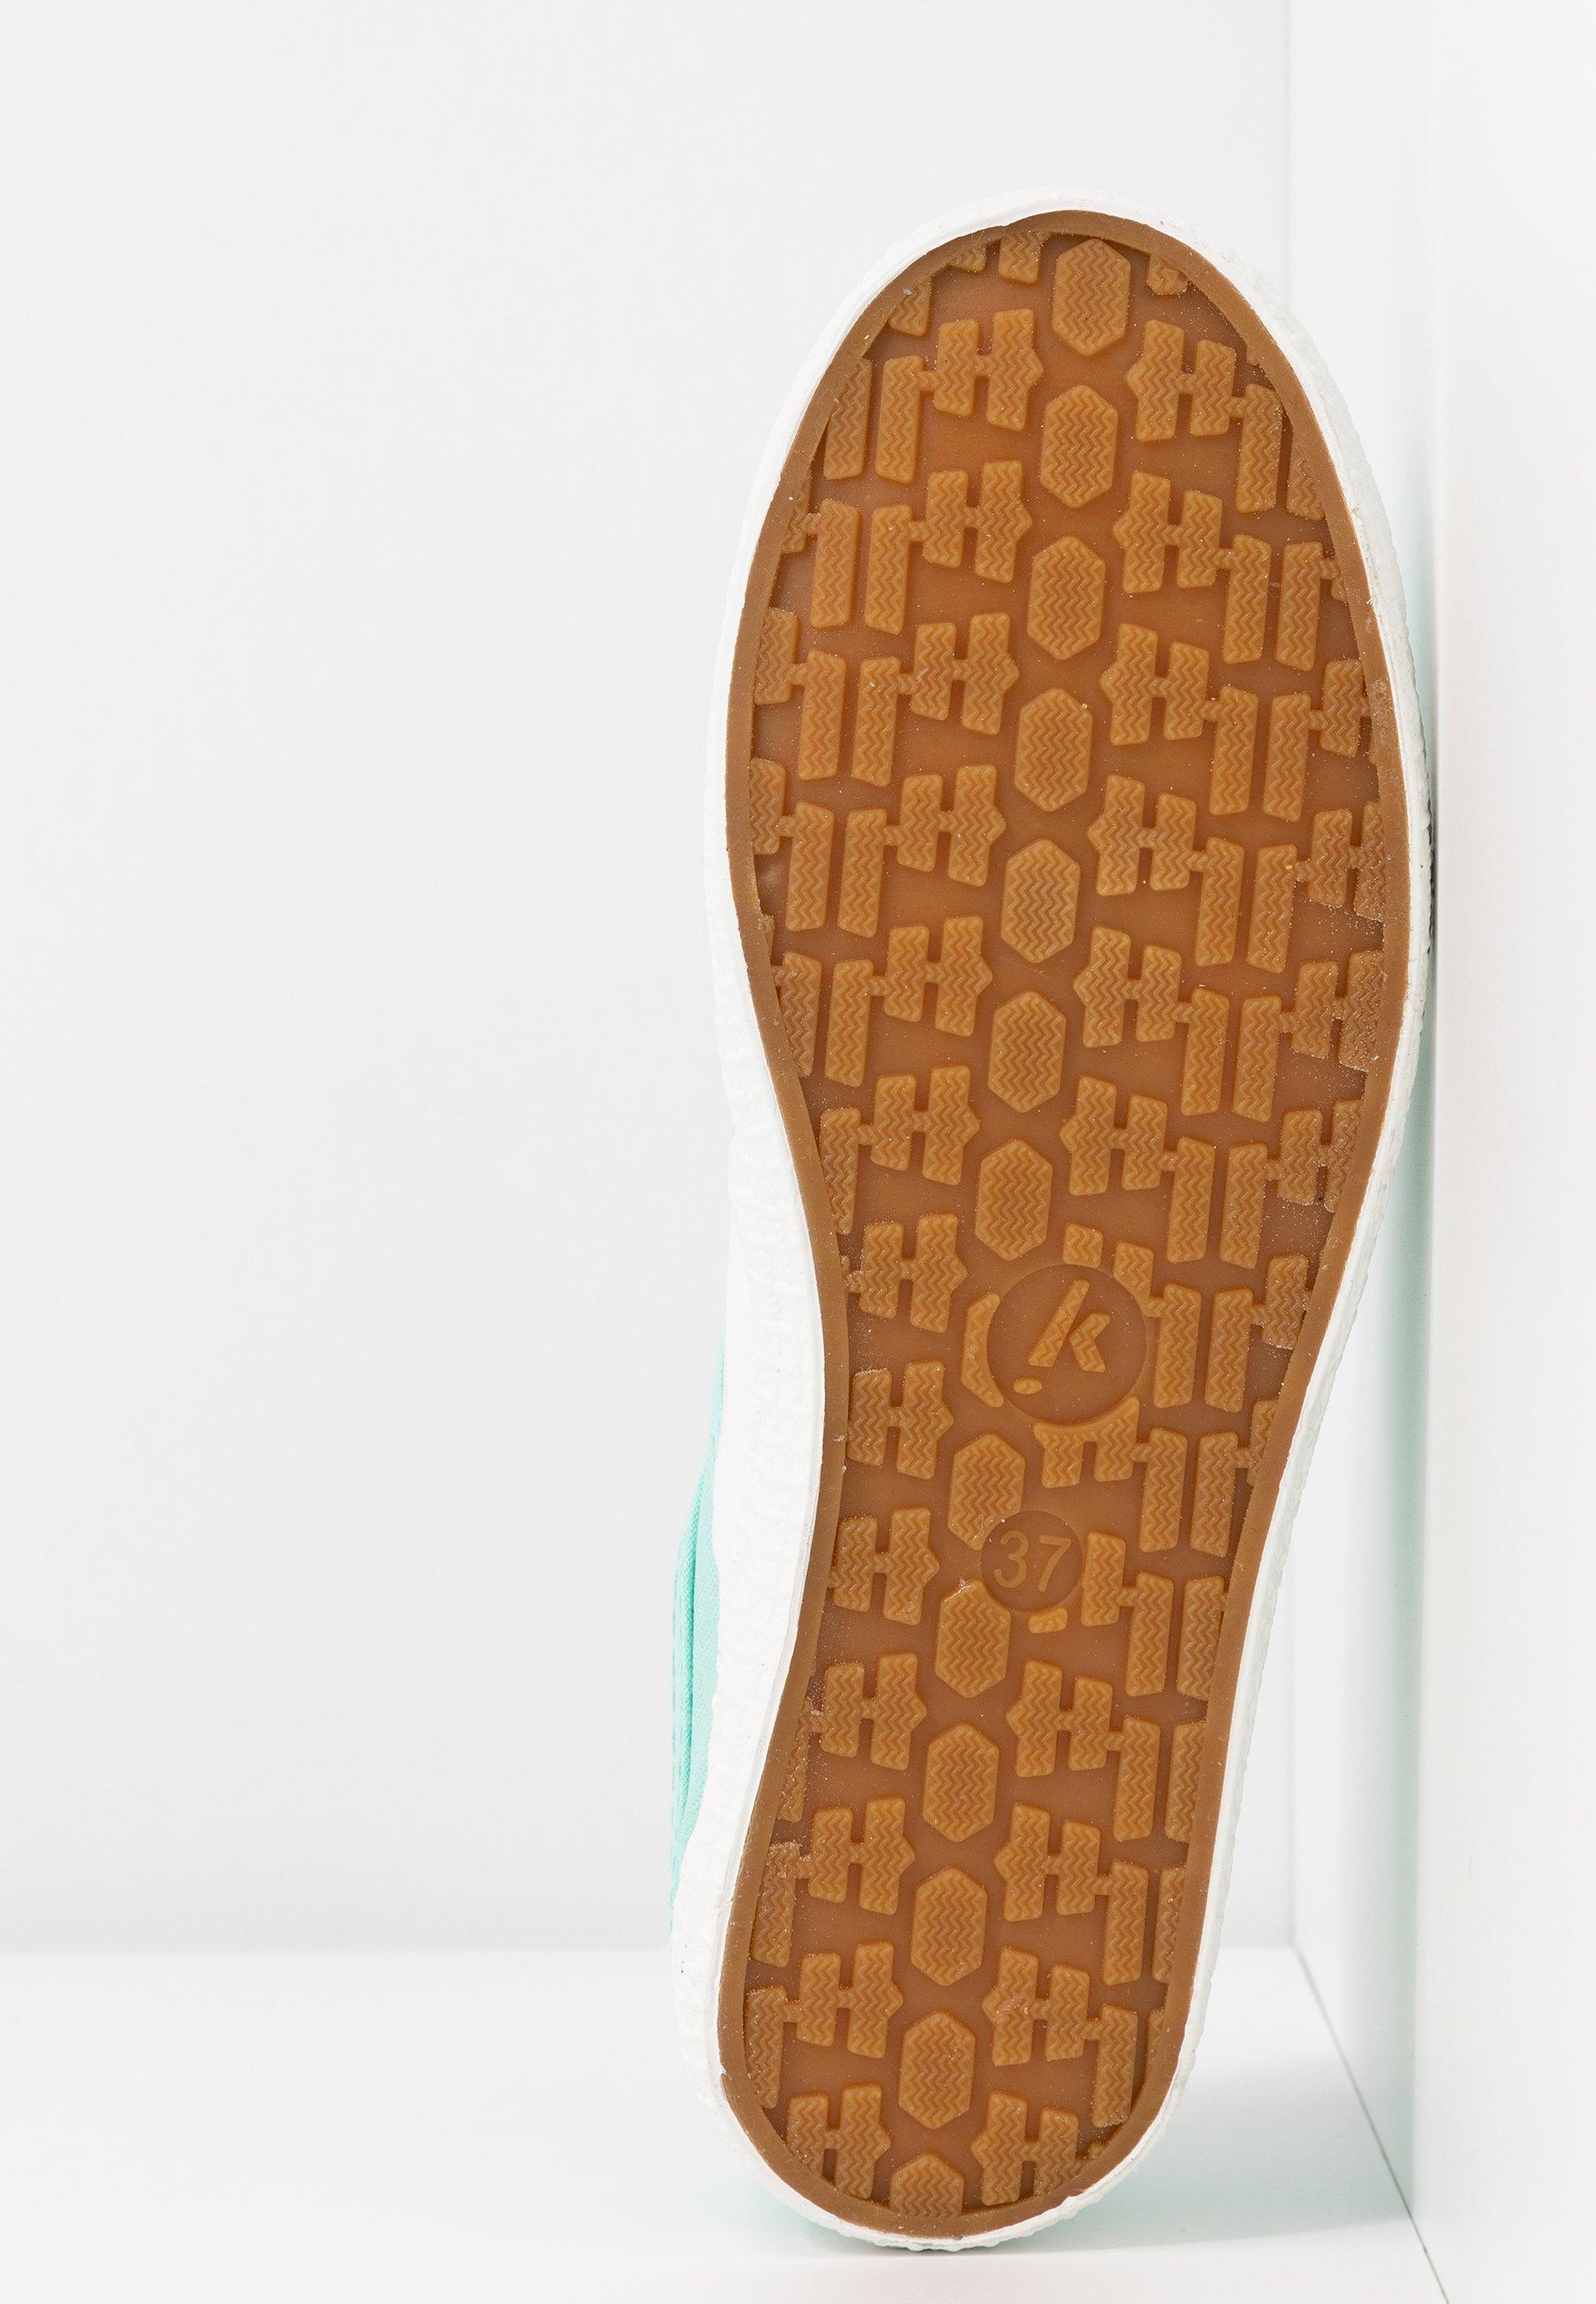 Kawasaki ORIGINAL - Baskets basses - gingermist - Sneakers femme Qualité